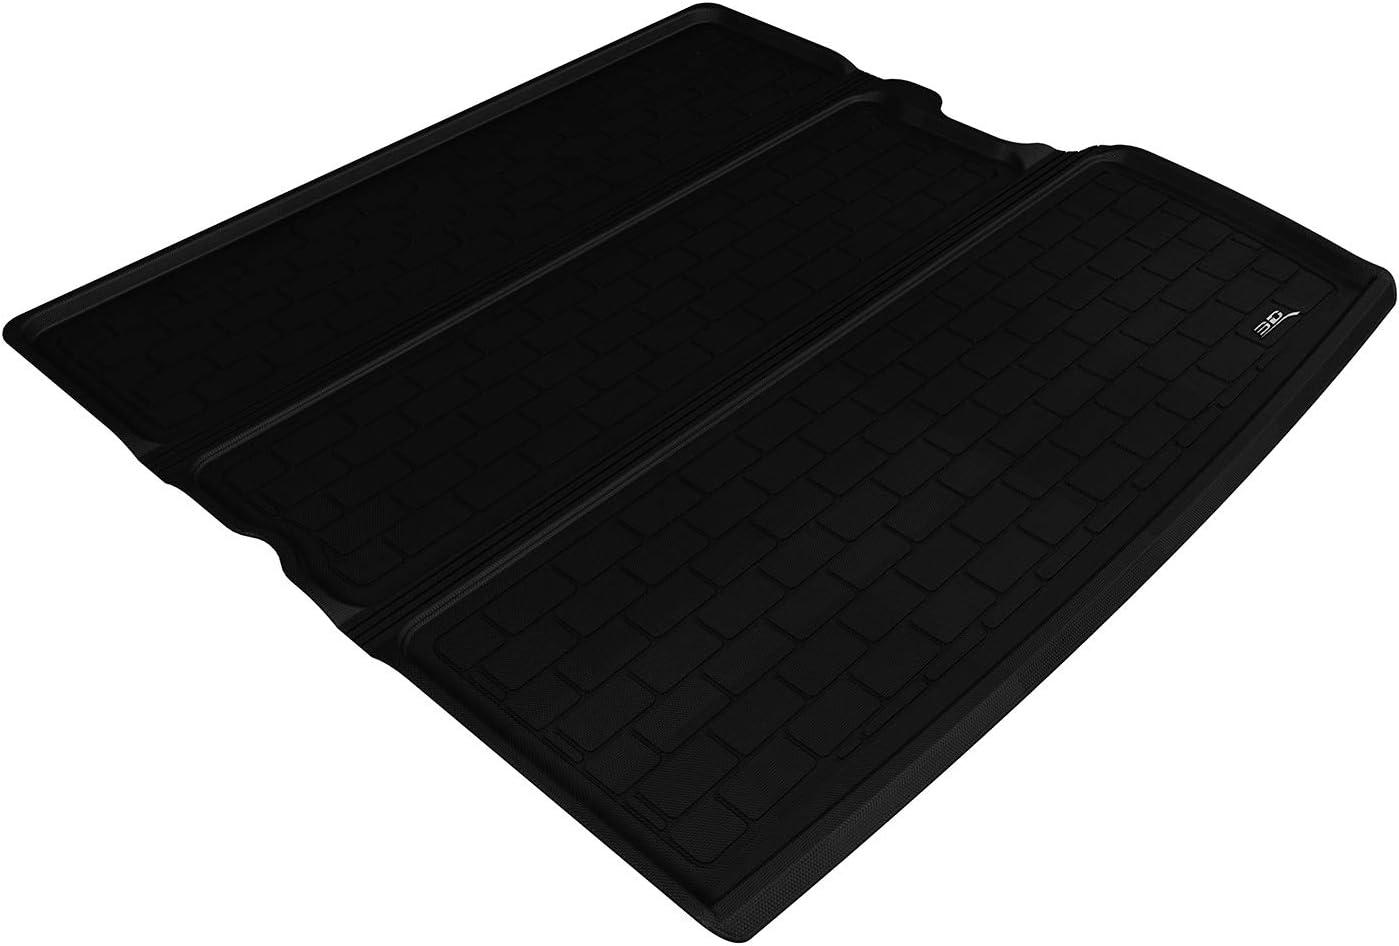 3D MAXpider M1VW0841309 Cargo Custom Fit All-Weather Floor Mat for Select Volkswagen Atlas Models Black Kagu Rubber